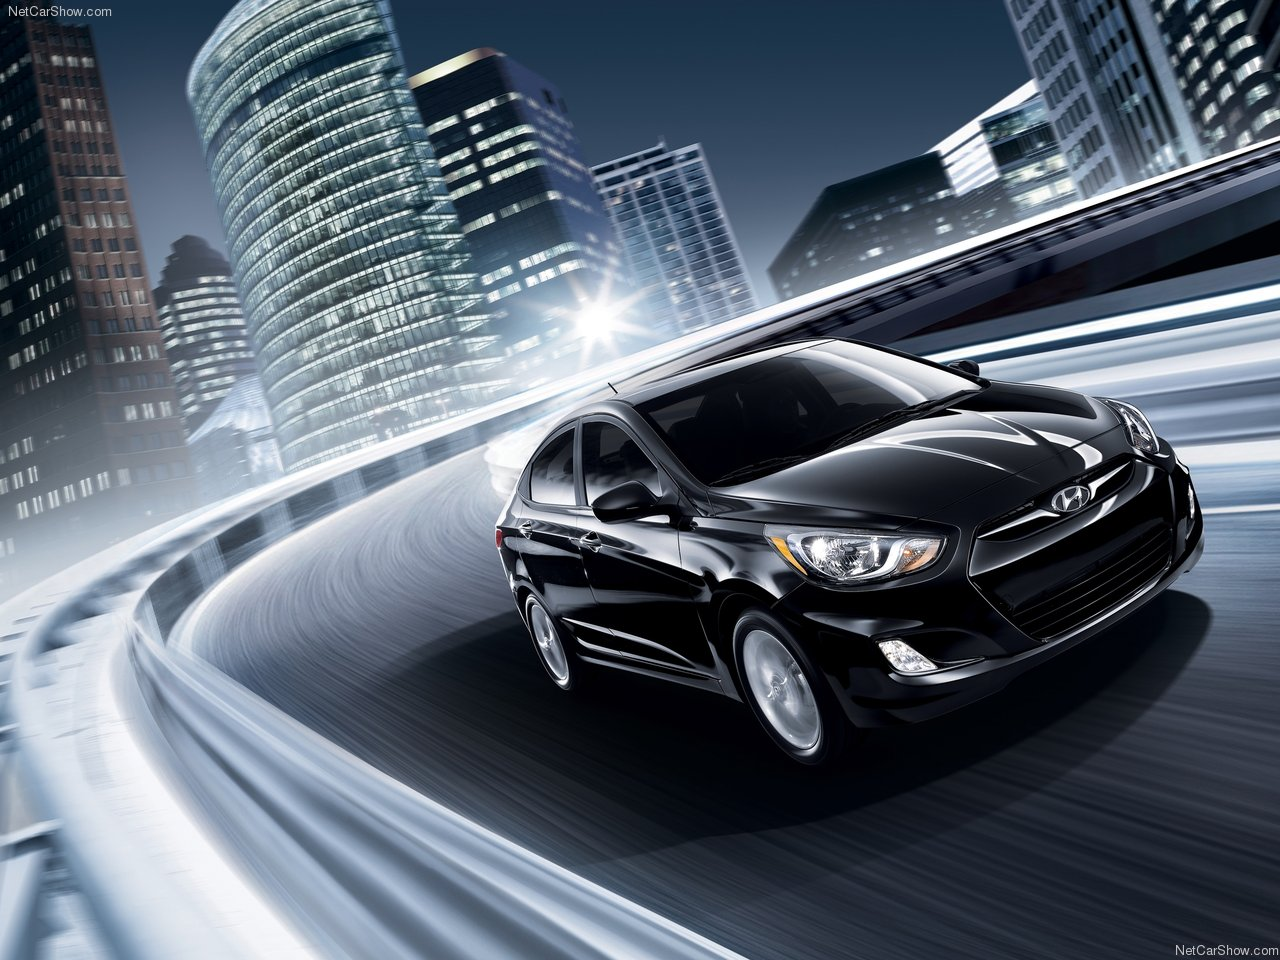 Hyundai Wallpapers Download 83VR77V   4USkY 1280x960